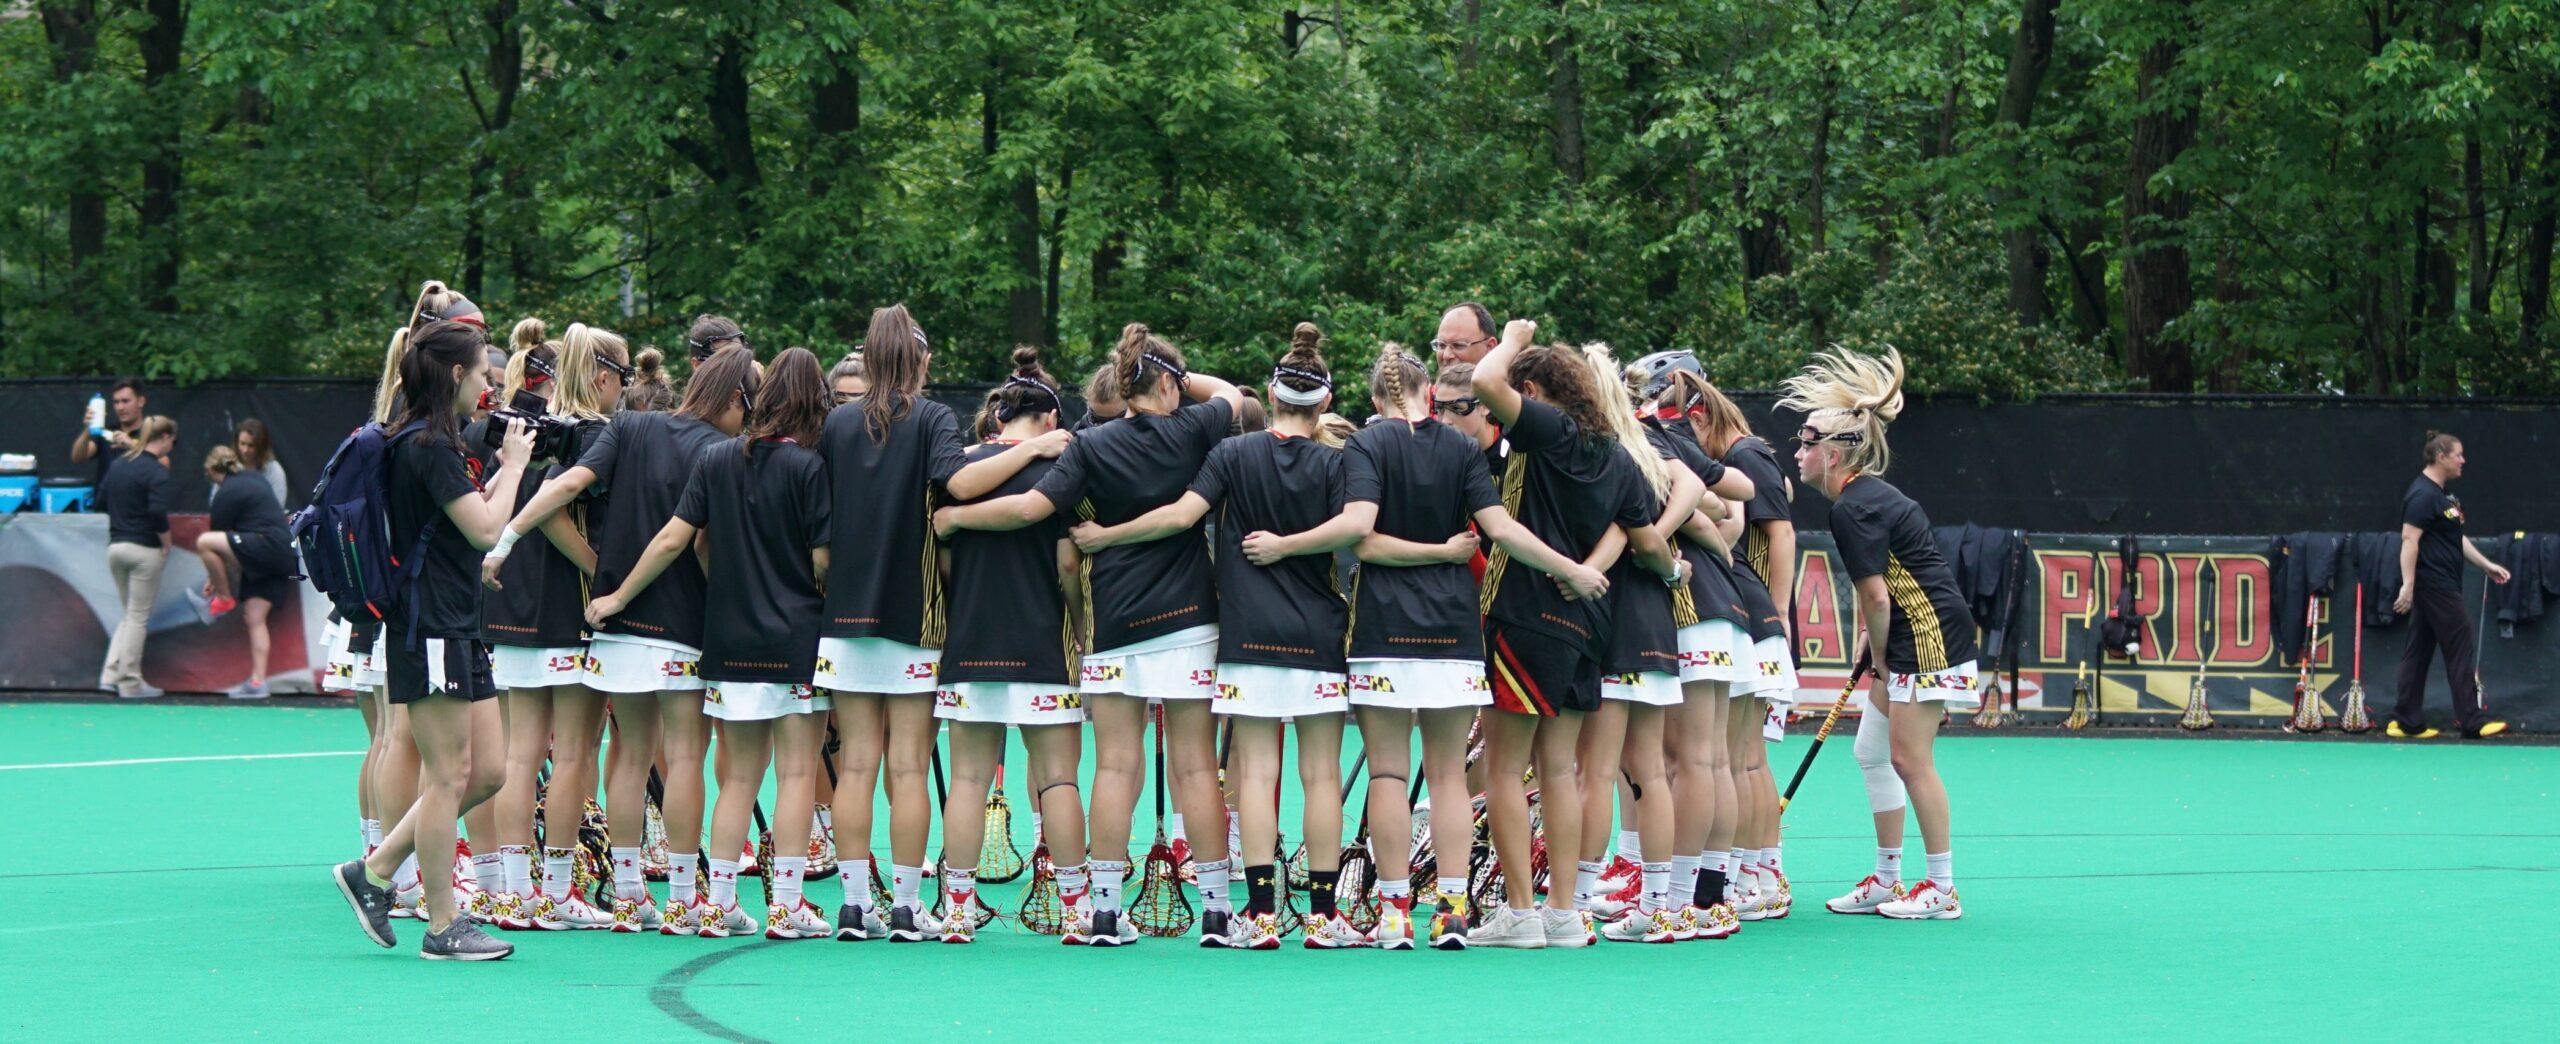 Nikki Haley: Protect Women's Sports